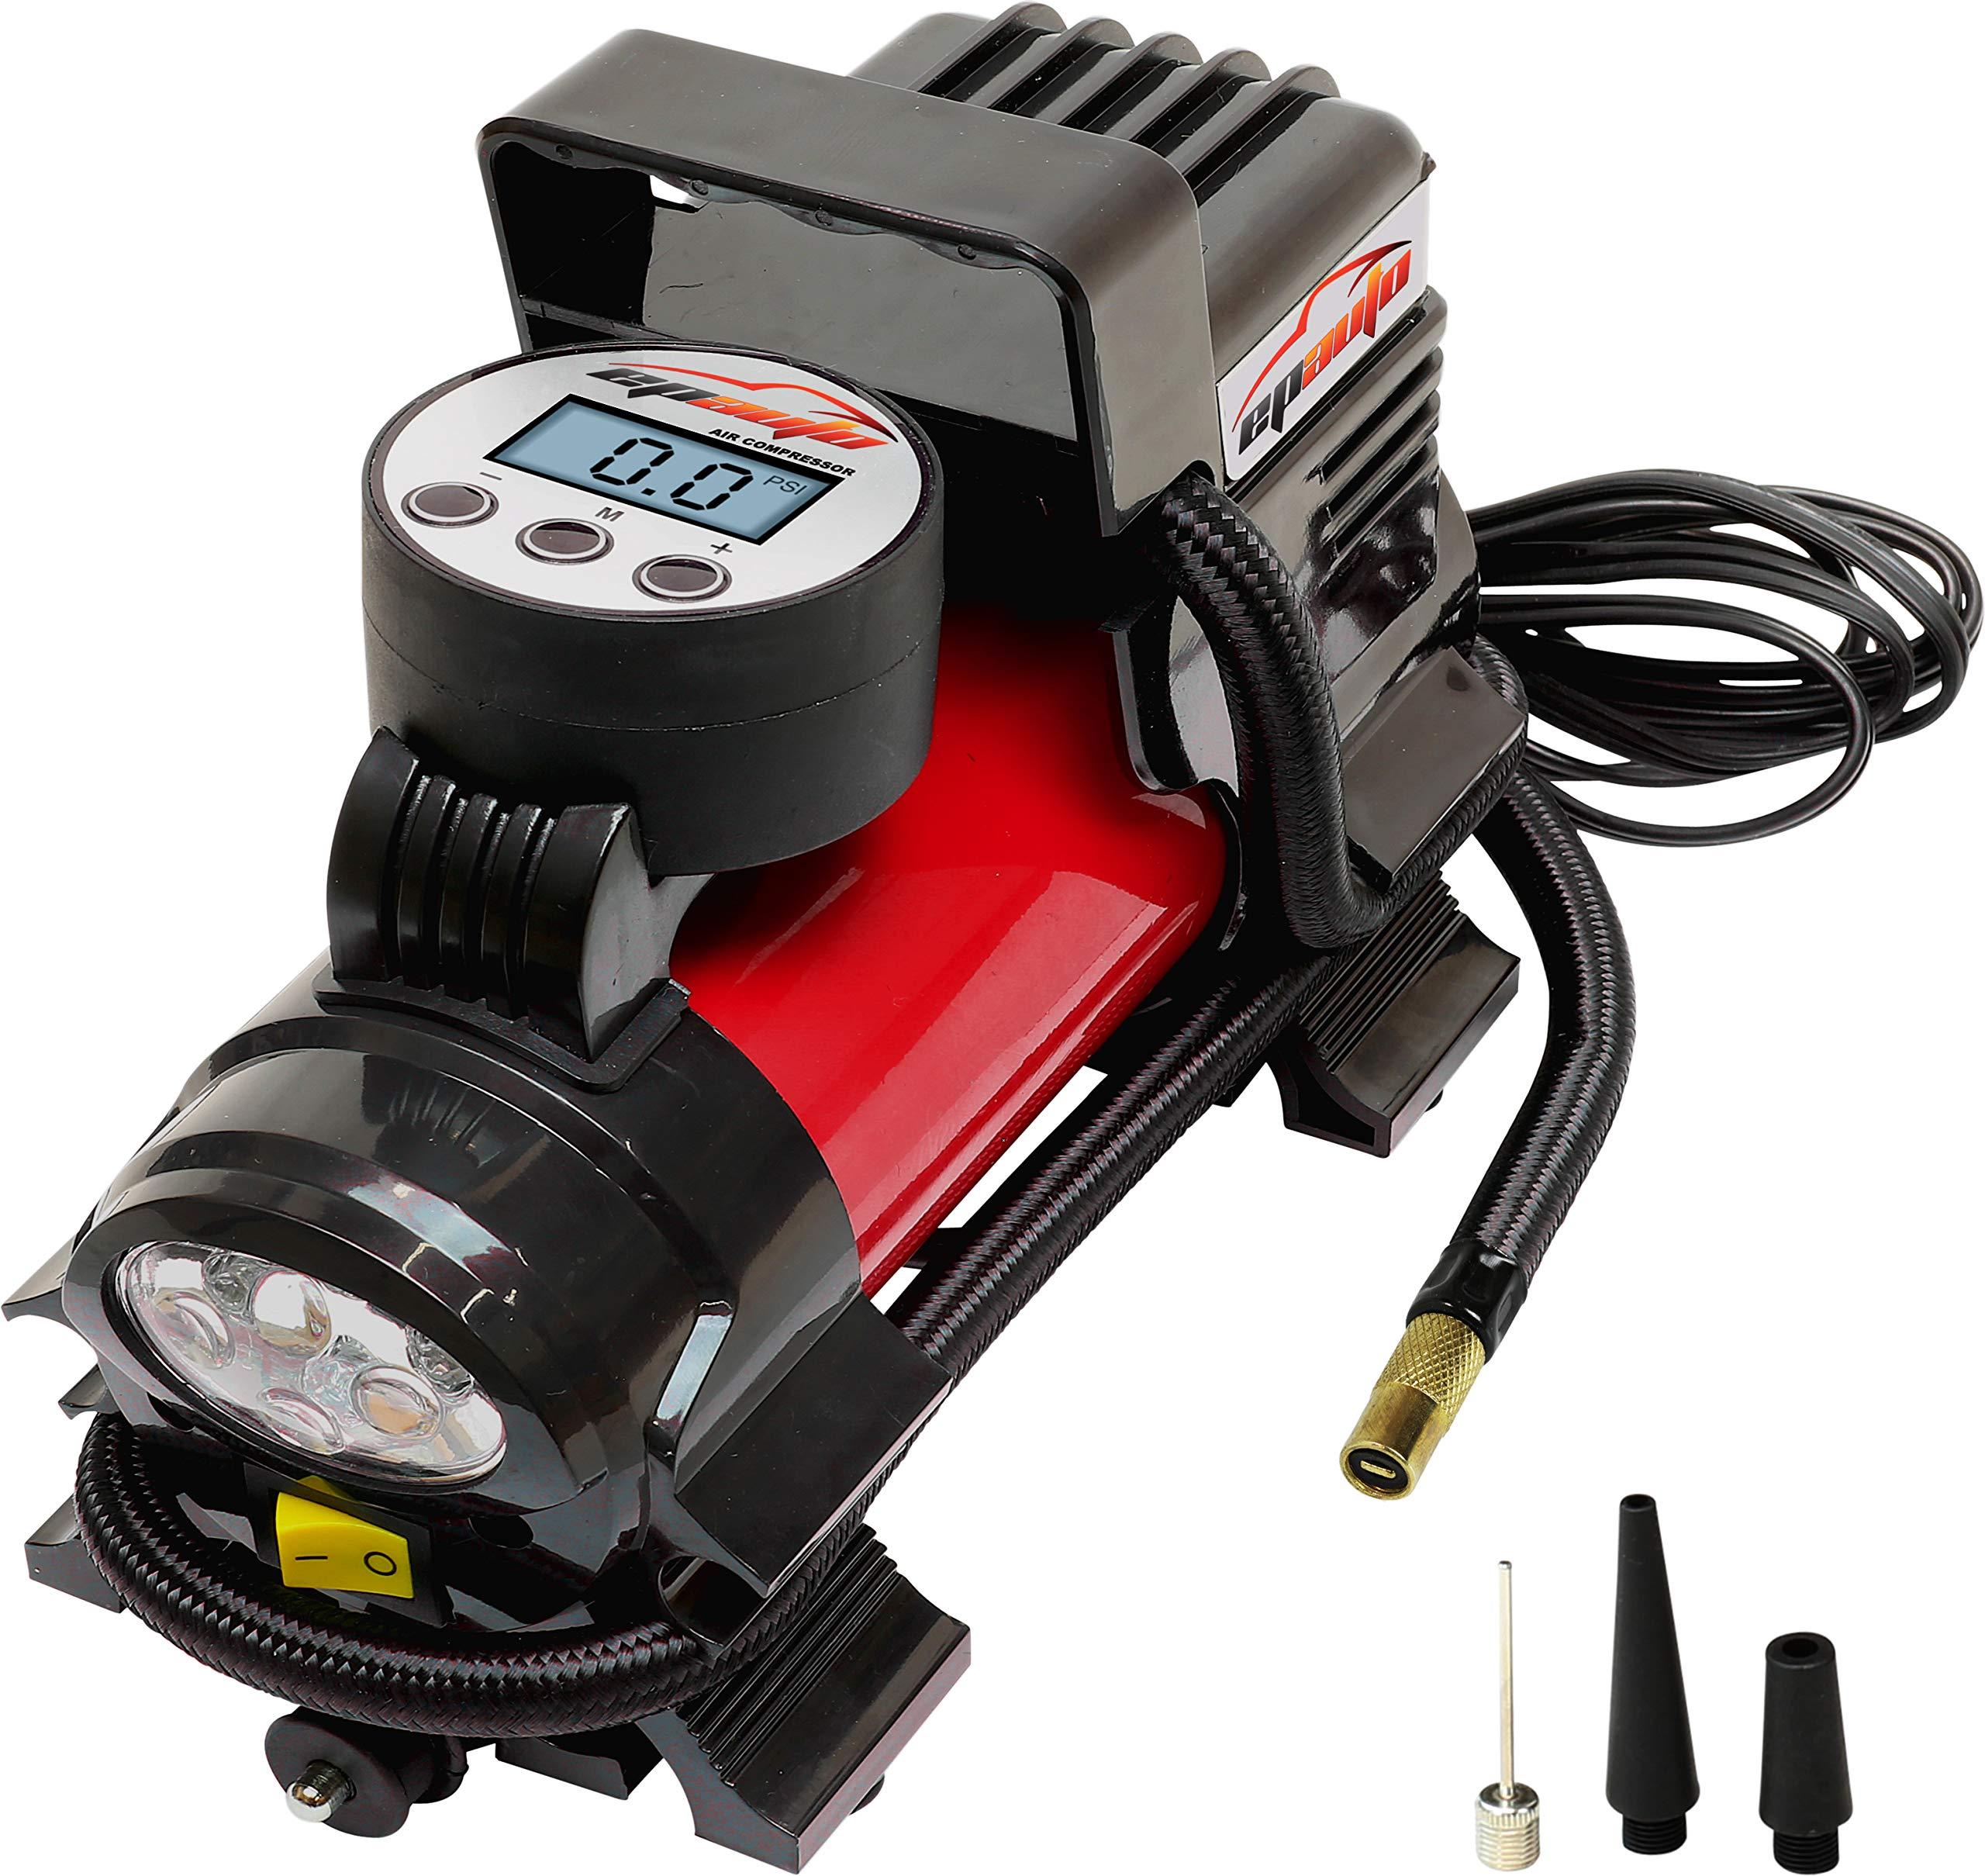 EPAuto Portable Compressor Digital Inflator